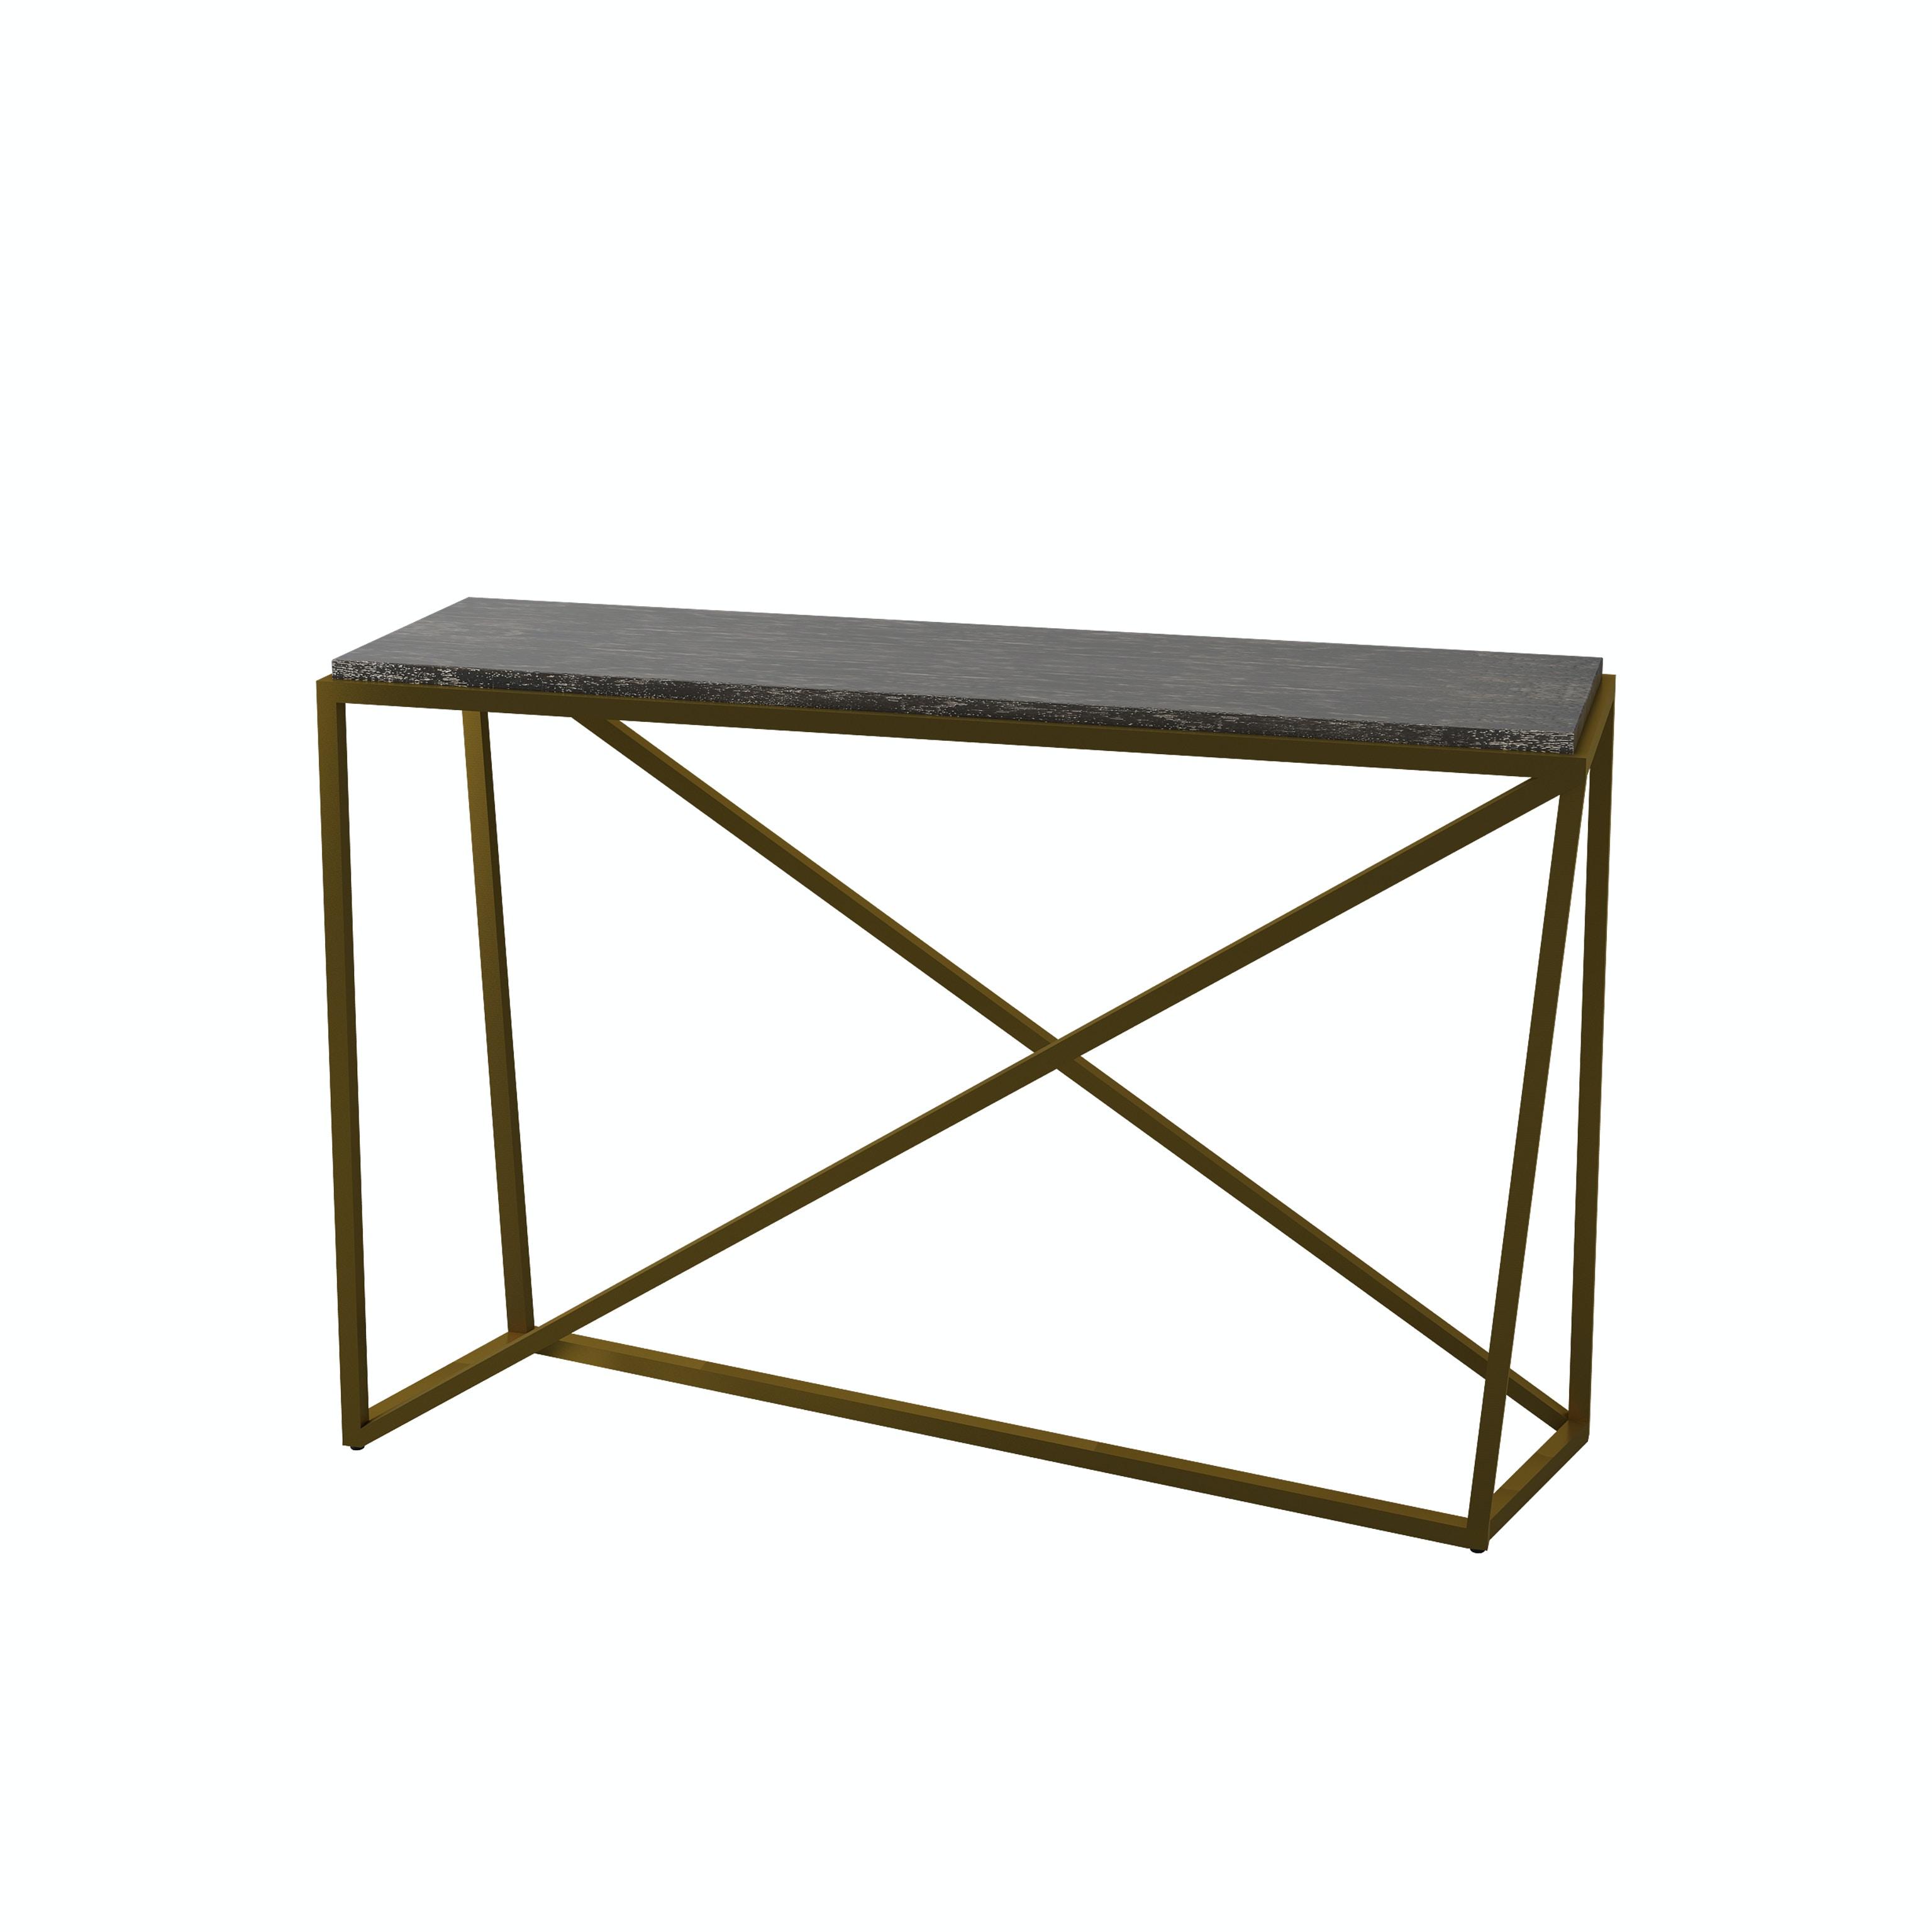 Theodore Alexander Furniture Crazy X Console Table TAS53011.C078